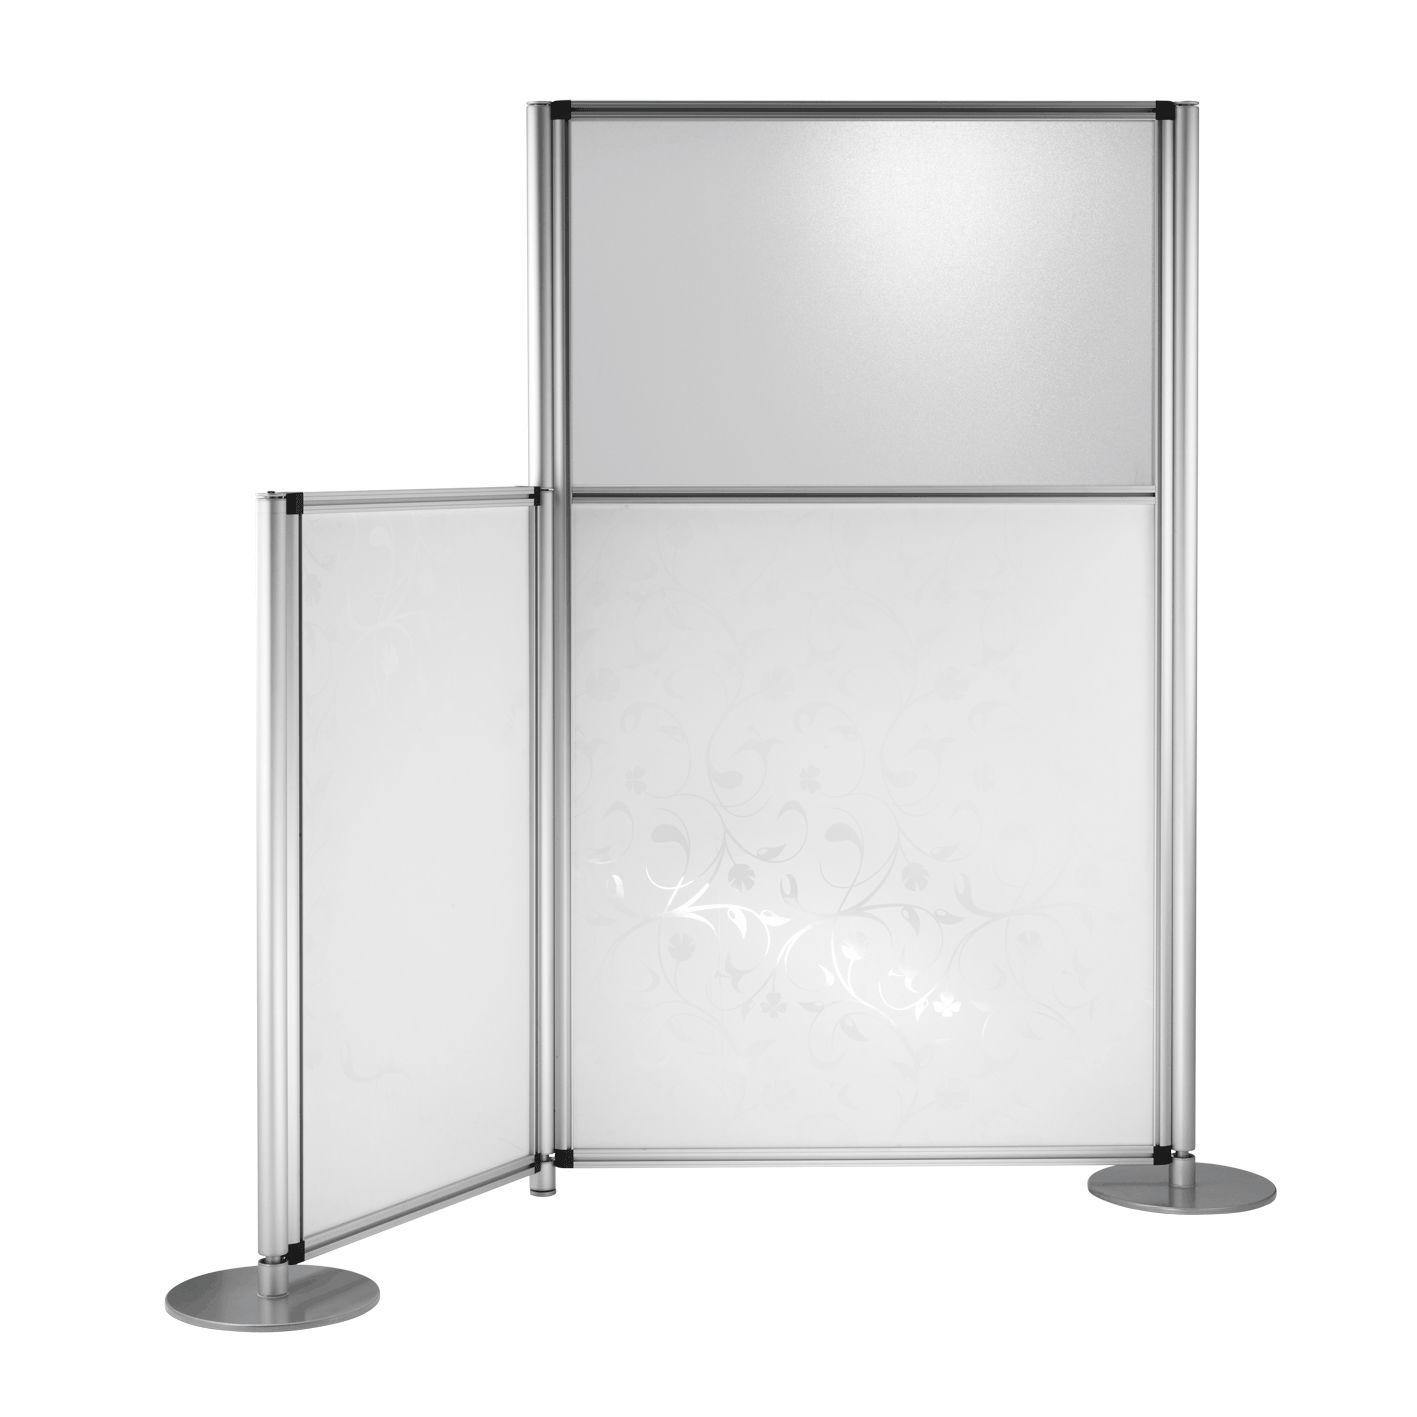 Abnehmbare Trennwand / Metall / Glas / Drahtgeflecht - PASSAGE SWP ...